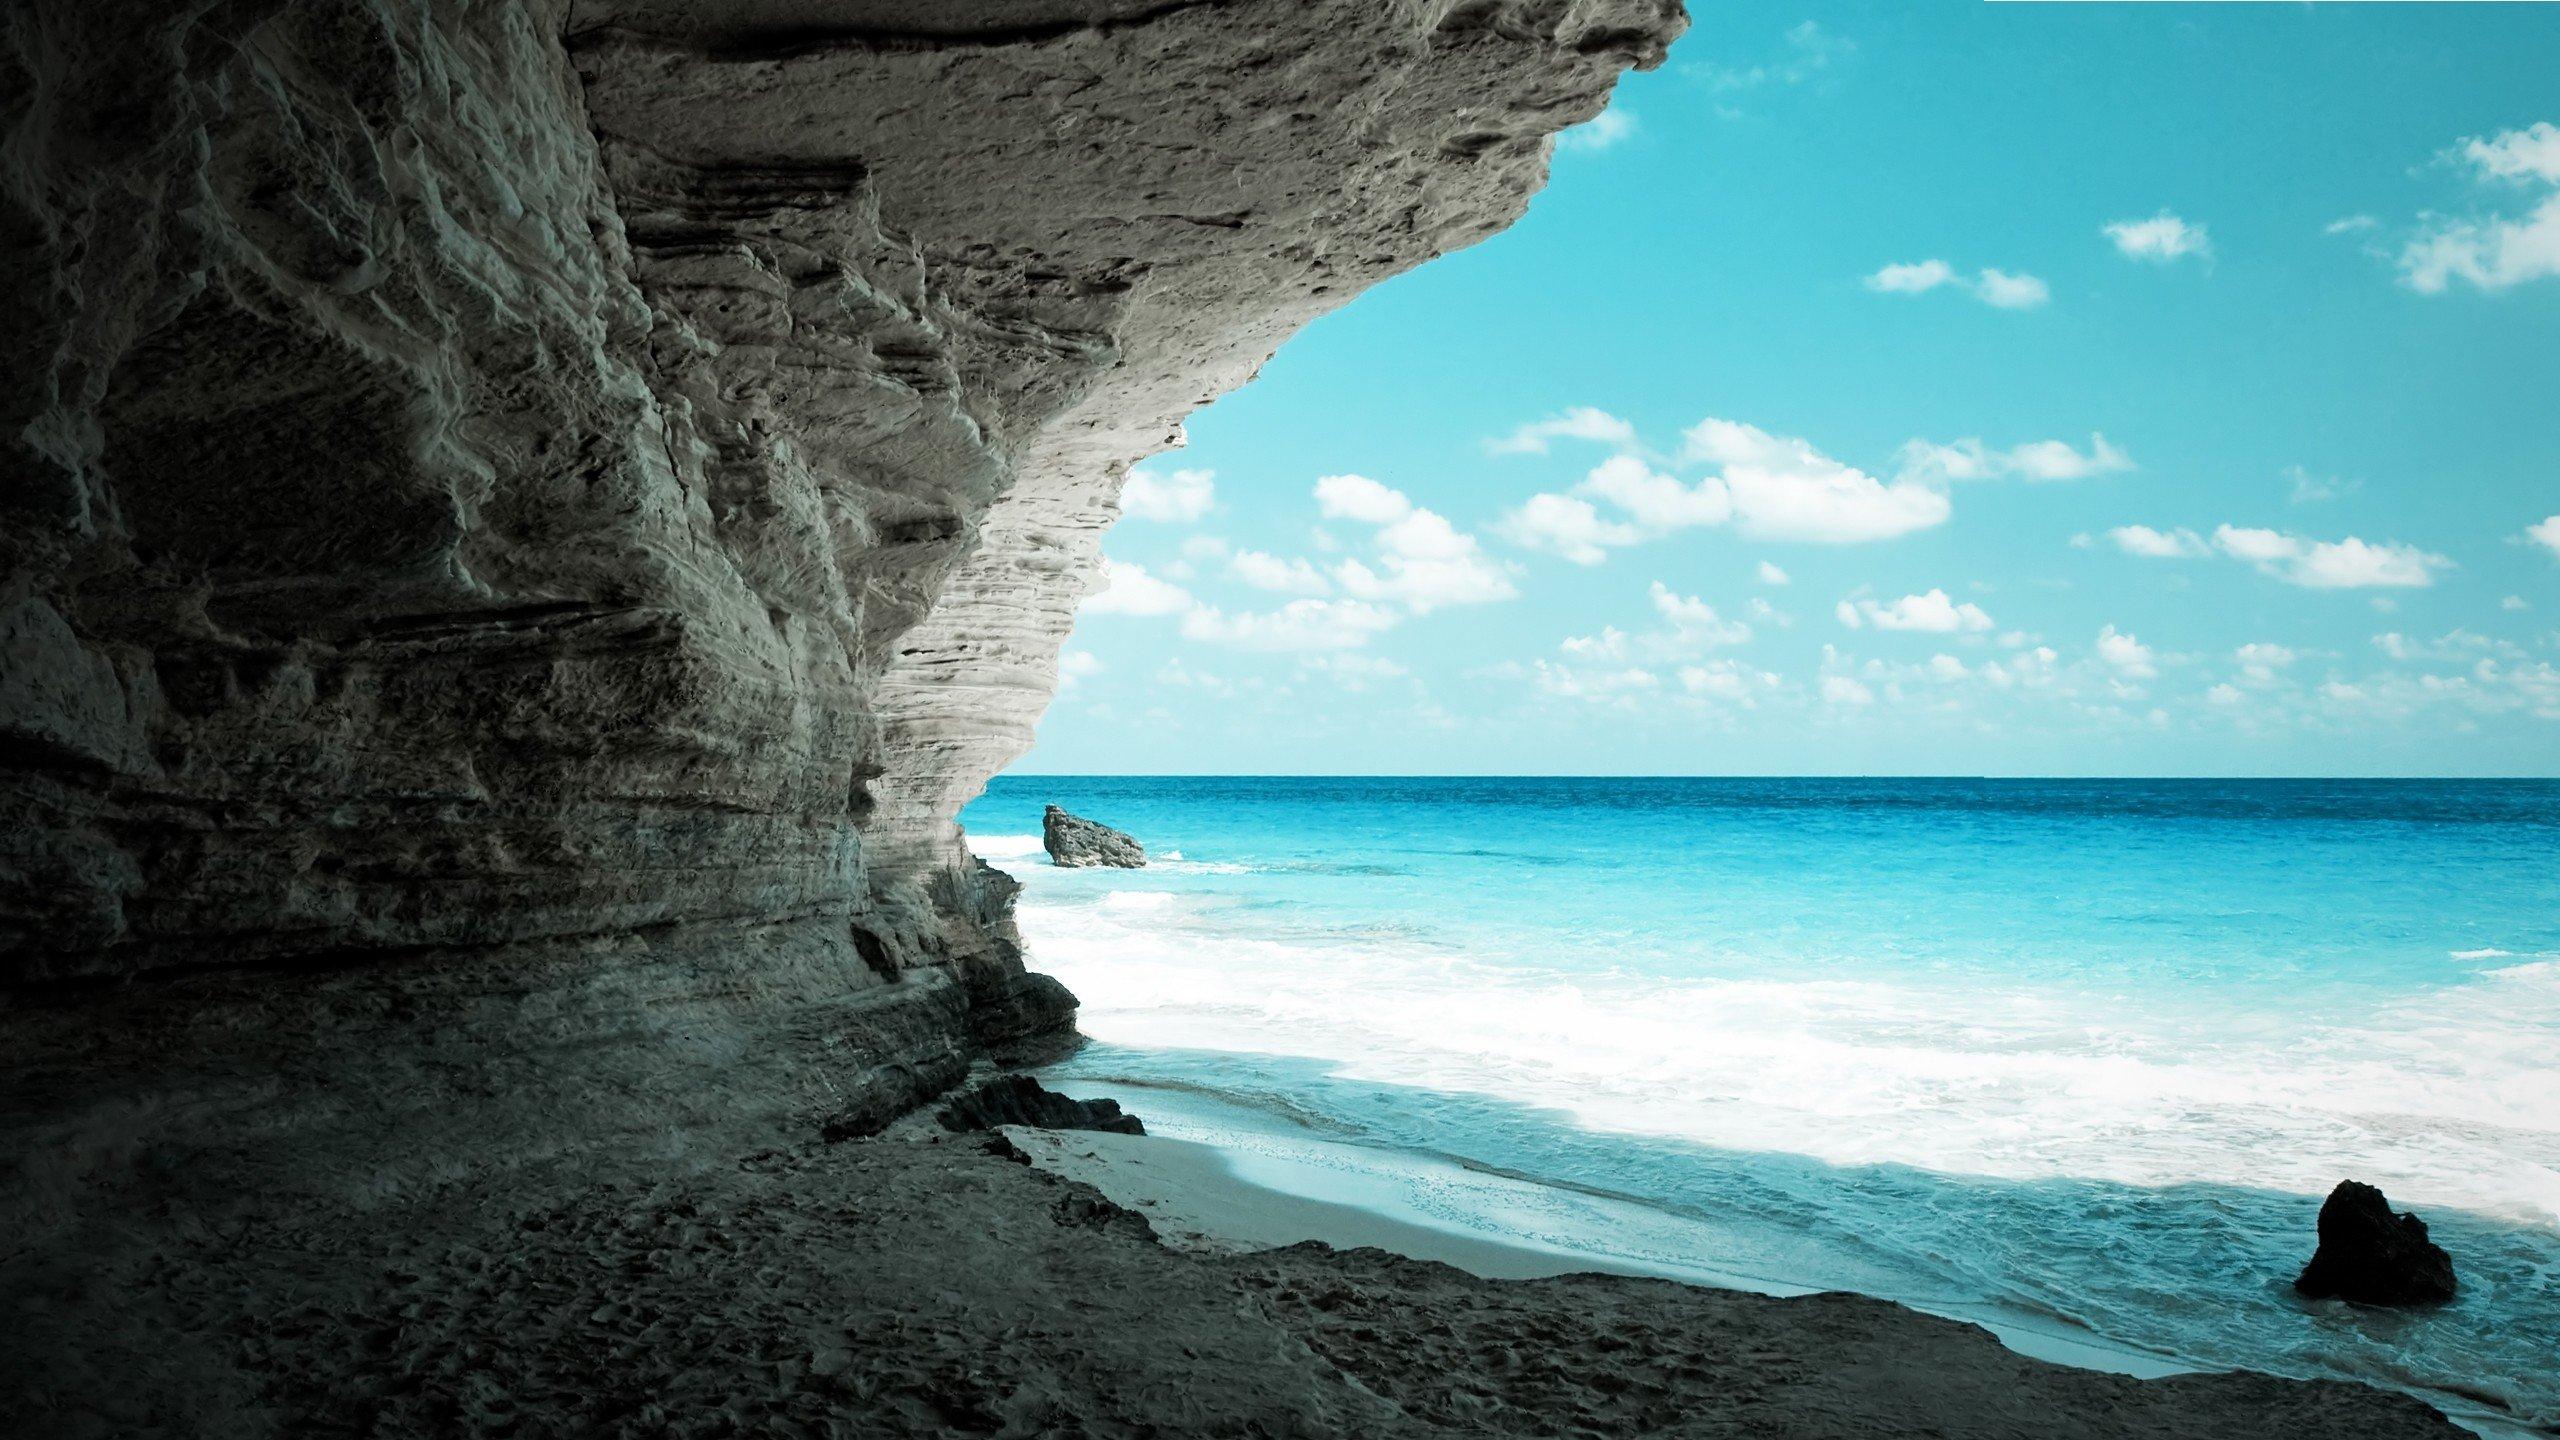 Beach Tumblr Wallpaper High Quality Resolution : Nature Wallpaper